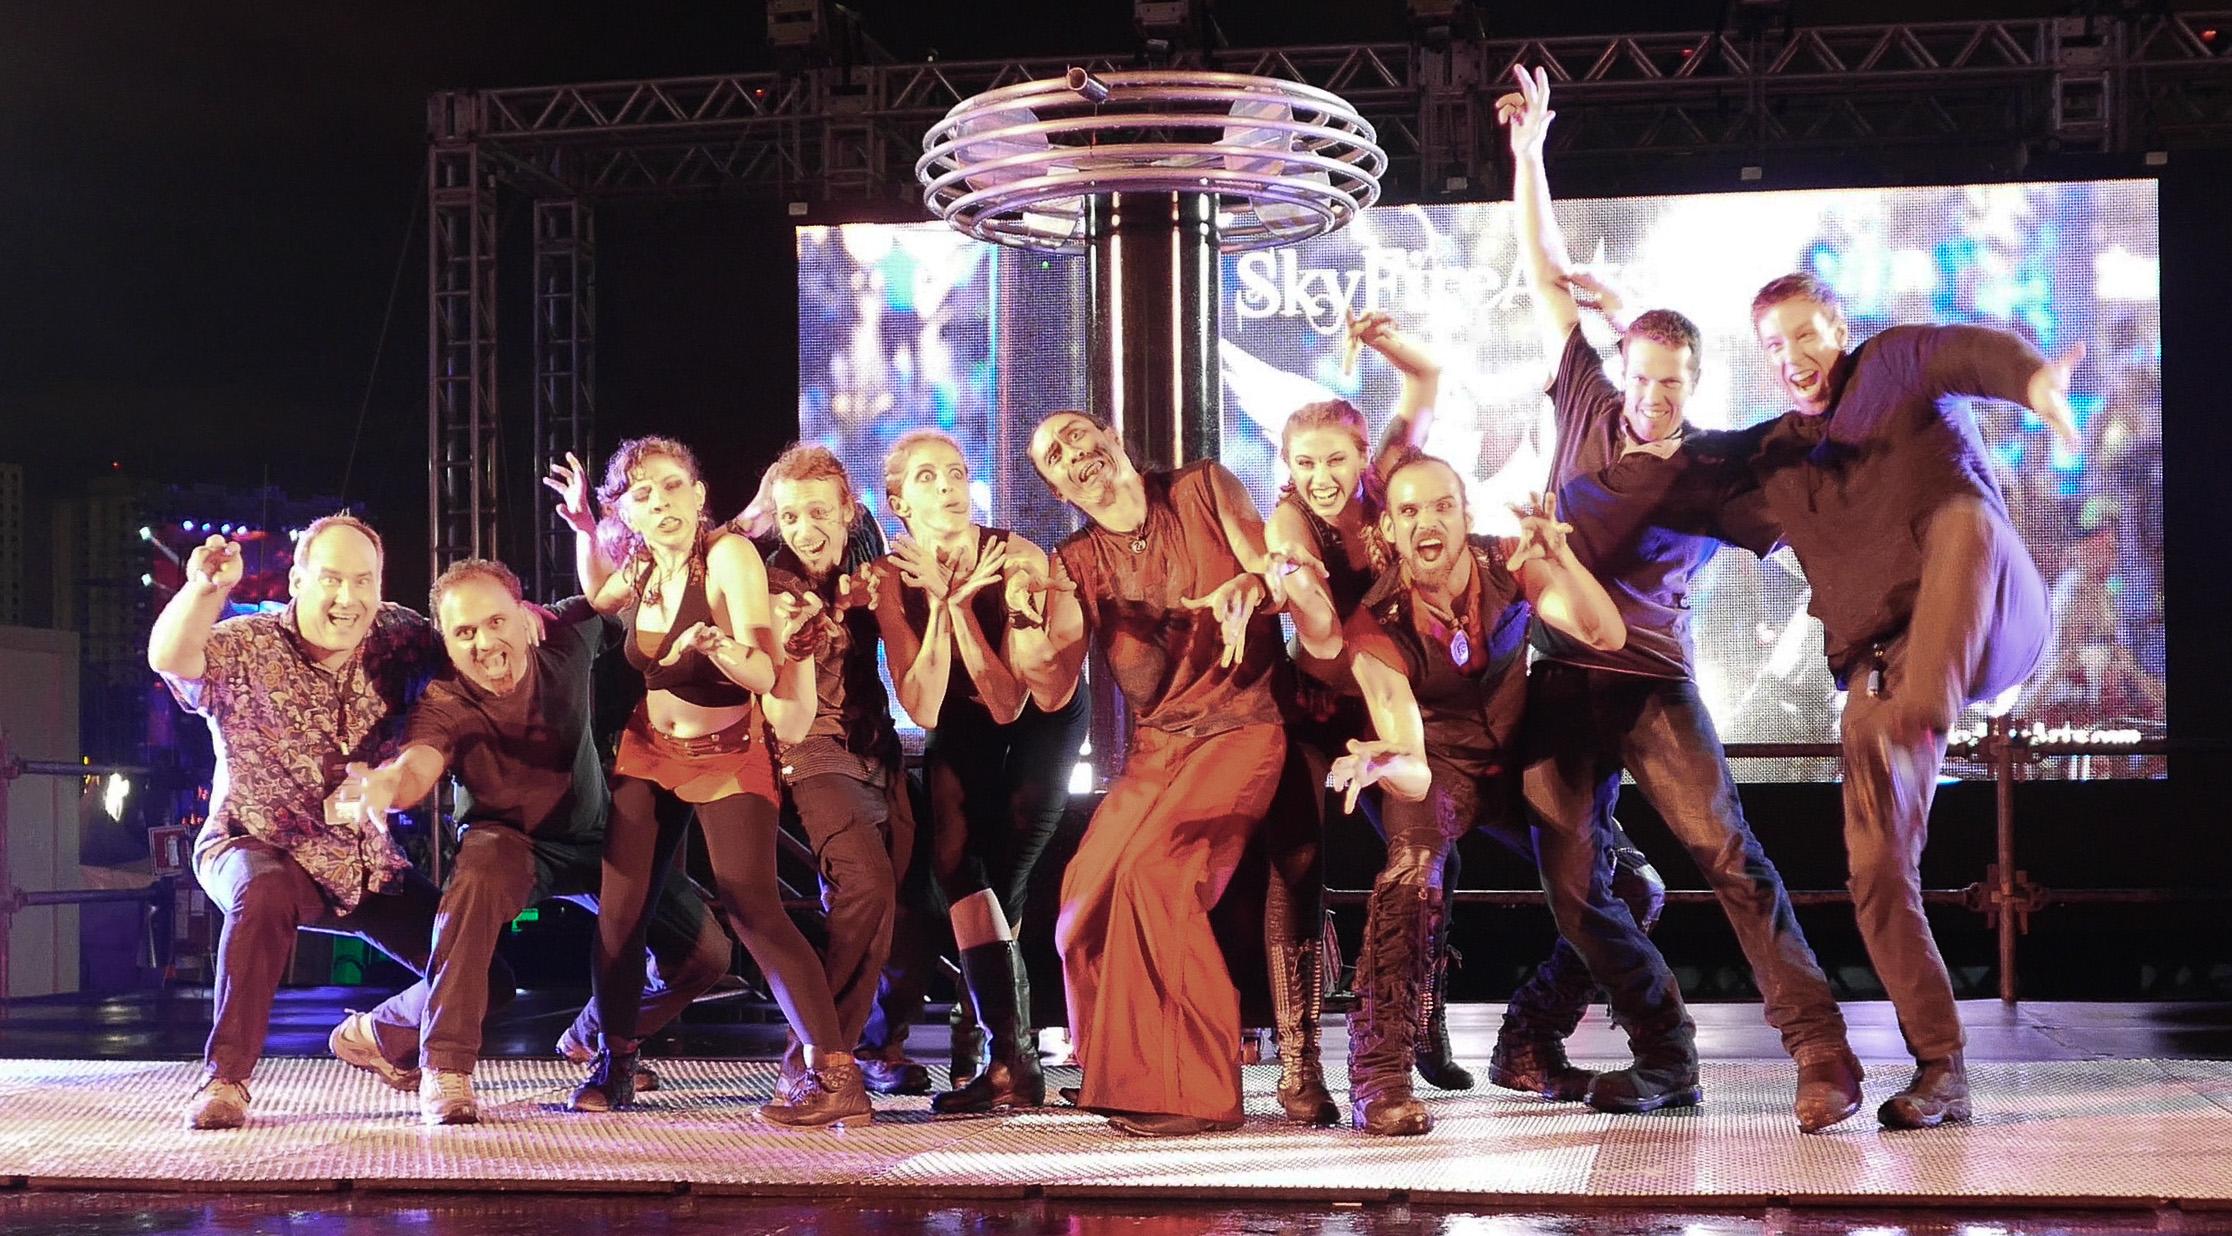 Team Skyfire - EDC Brasil (Marc Rosenthal, Sandy Bagri, Adrianna Widmann, Dustin Egelskind, Michelle LaVon, Michael Ravenwood, Samantha Taylor, Lester Mooney, Justin Hays, and Thomas Beaty)